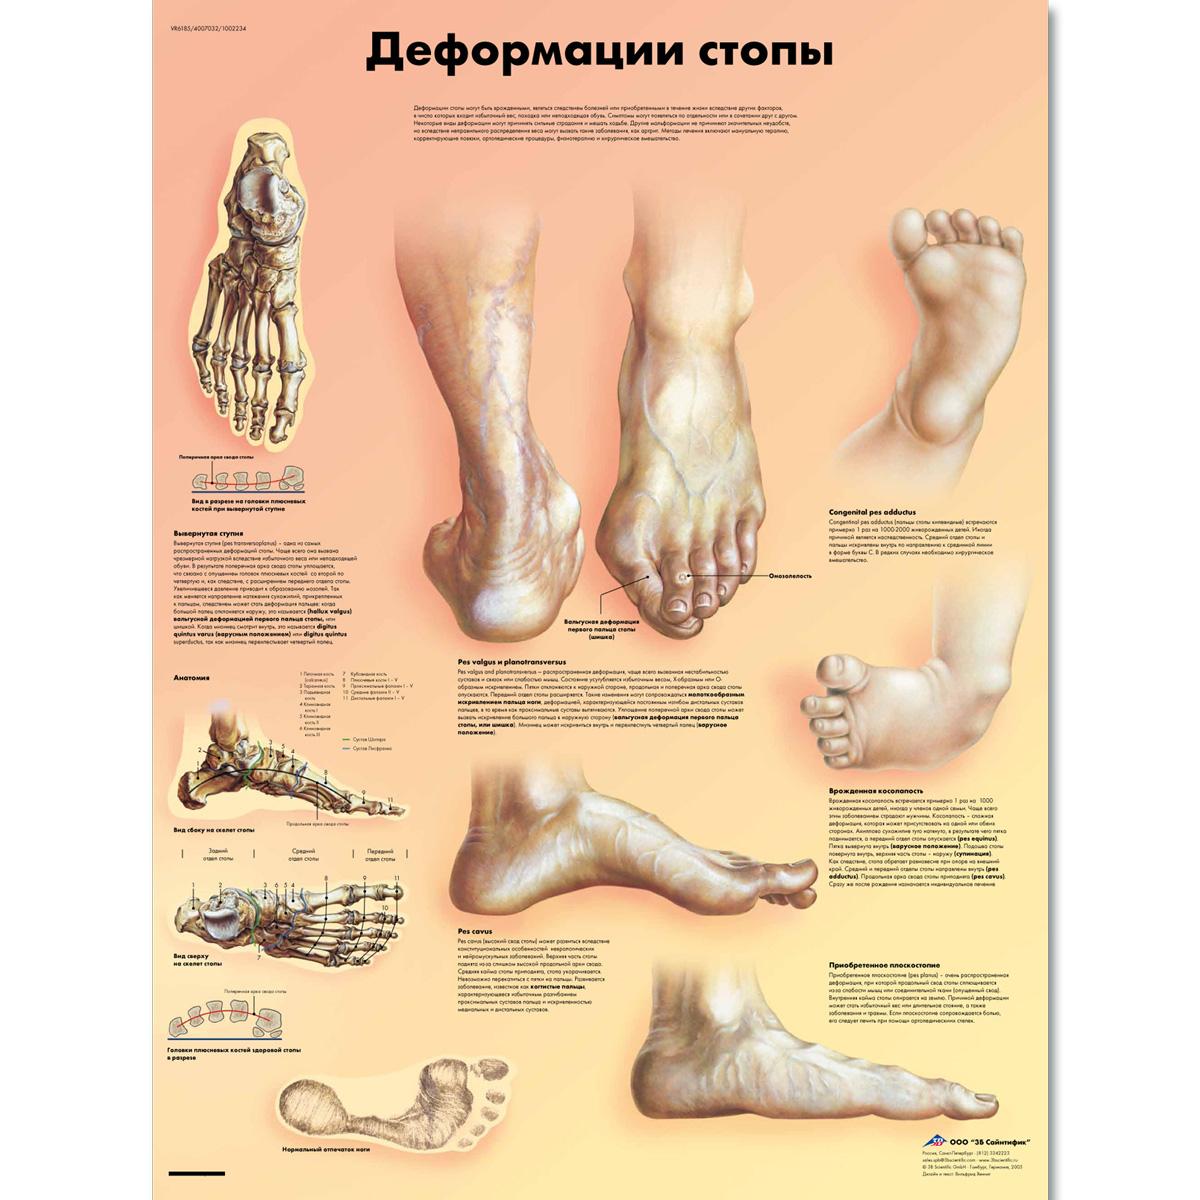 Deformities of the Feet Chart - 1002234 - VR6185L - ZVR6185L ...